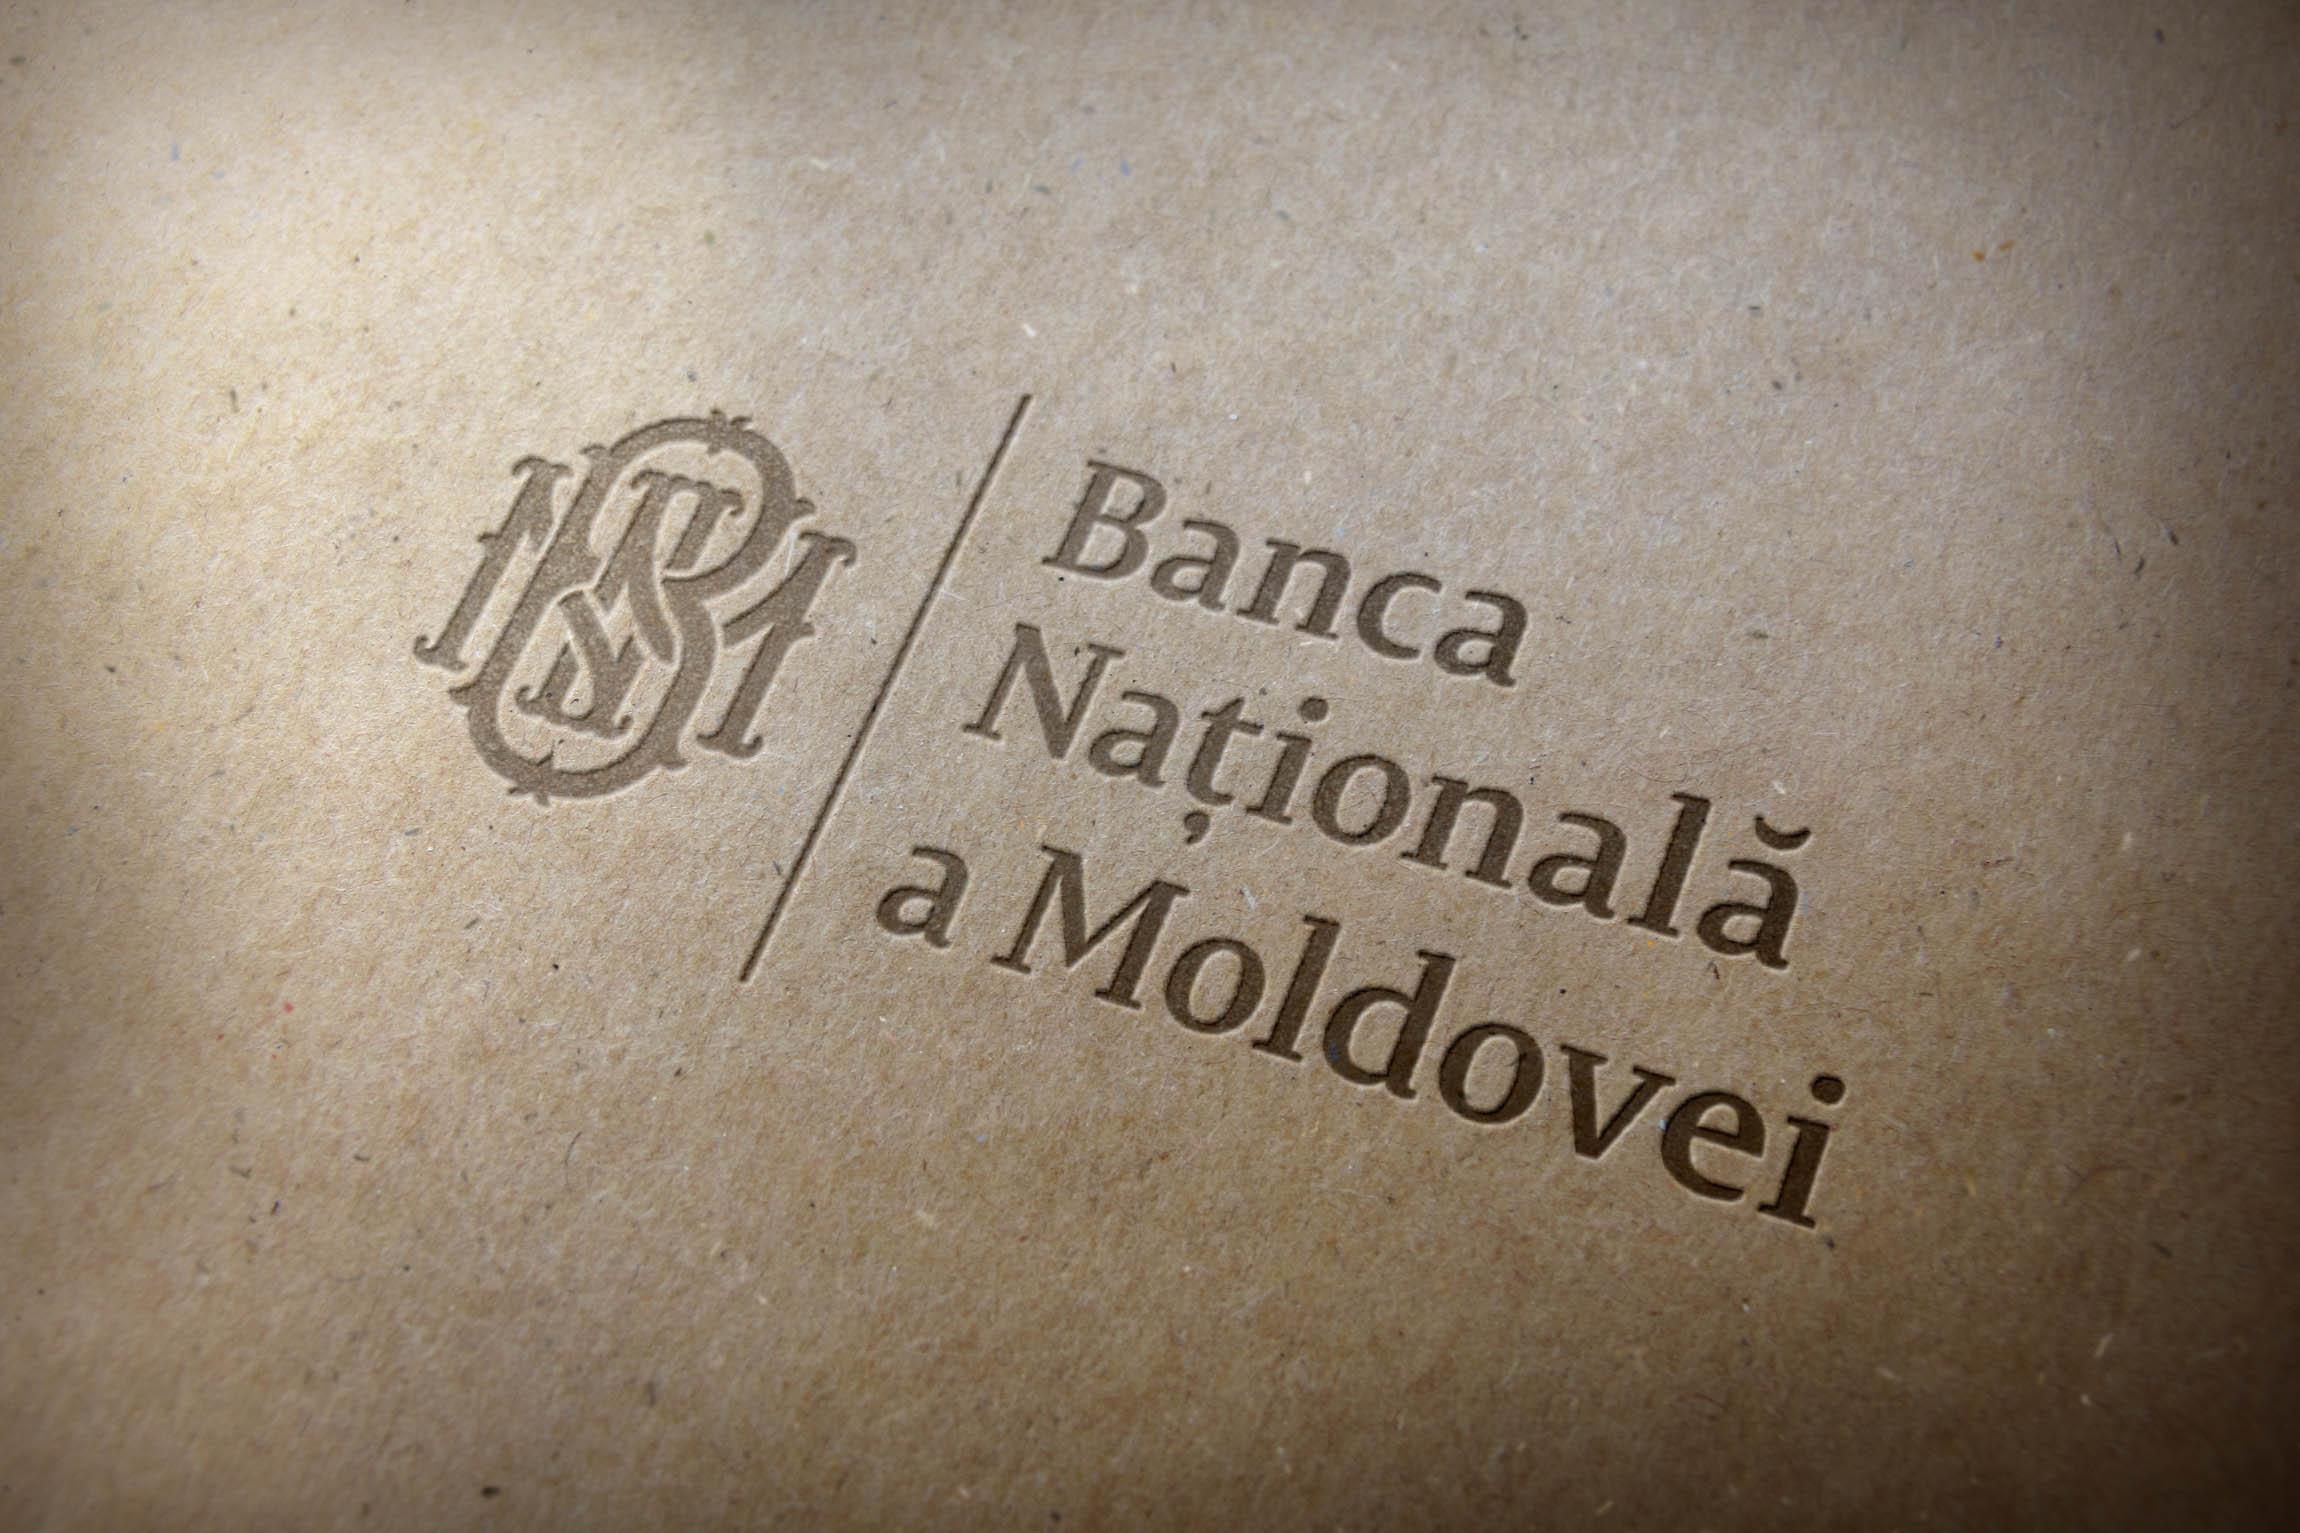 Banca nationala a moldovei иранская золотая монета сканворд